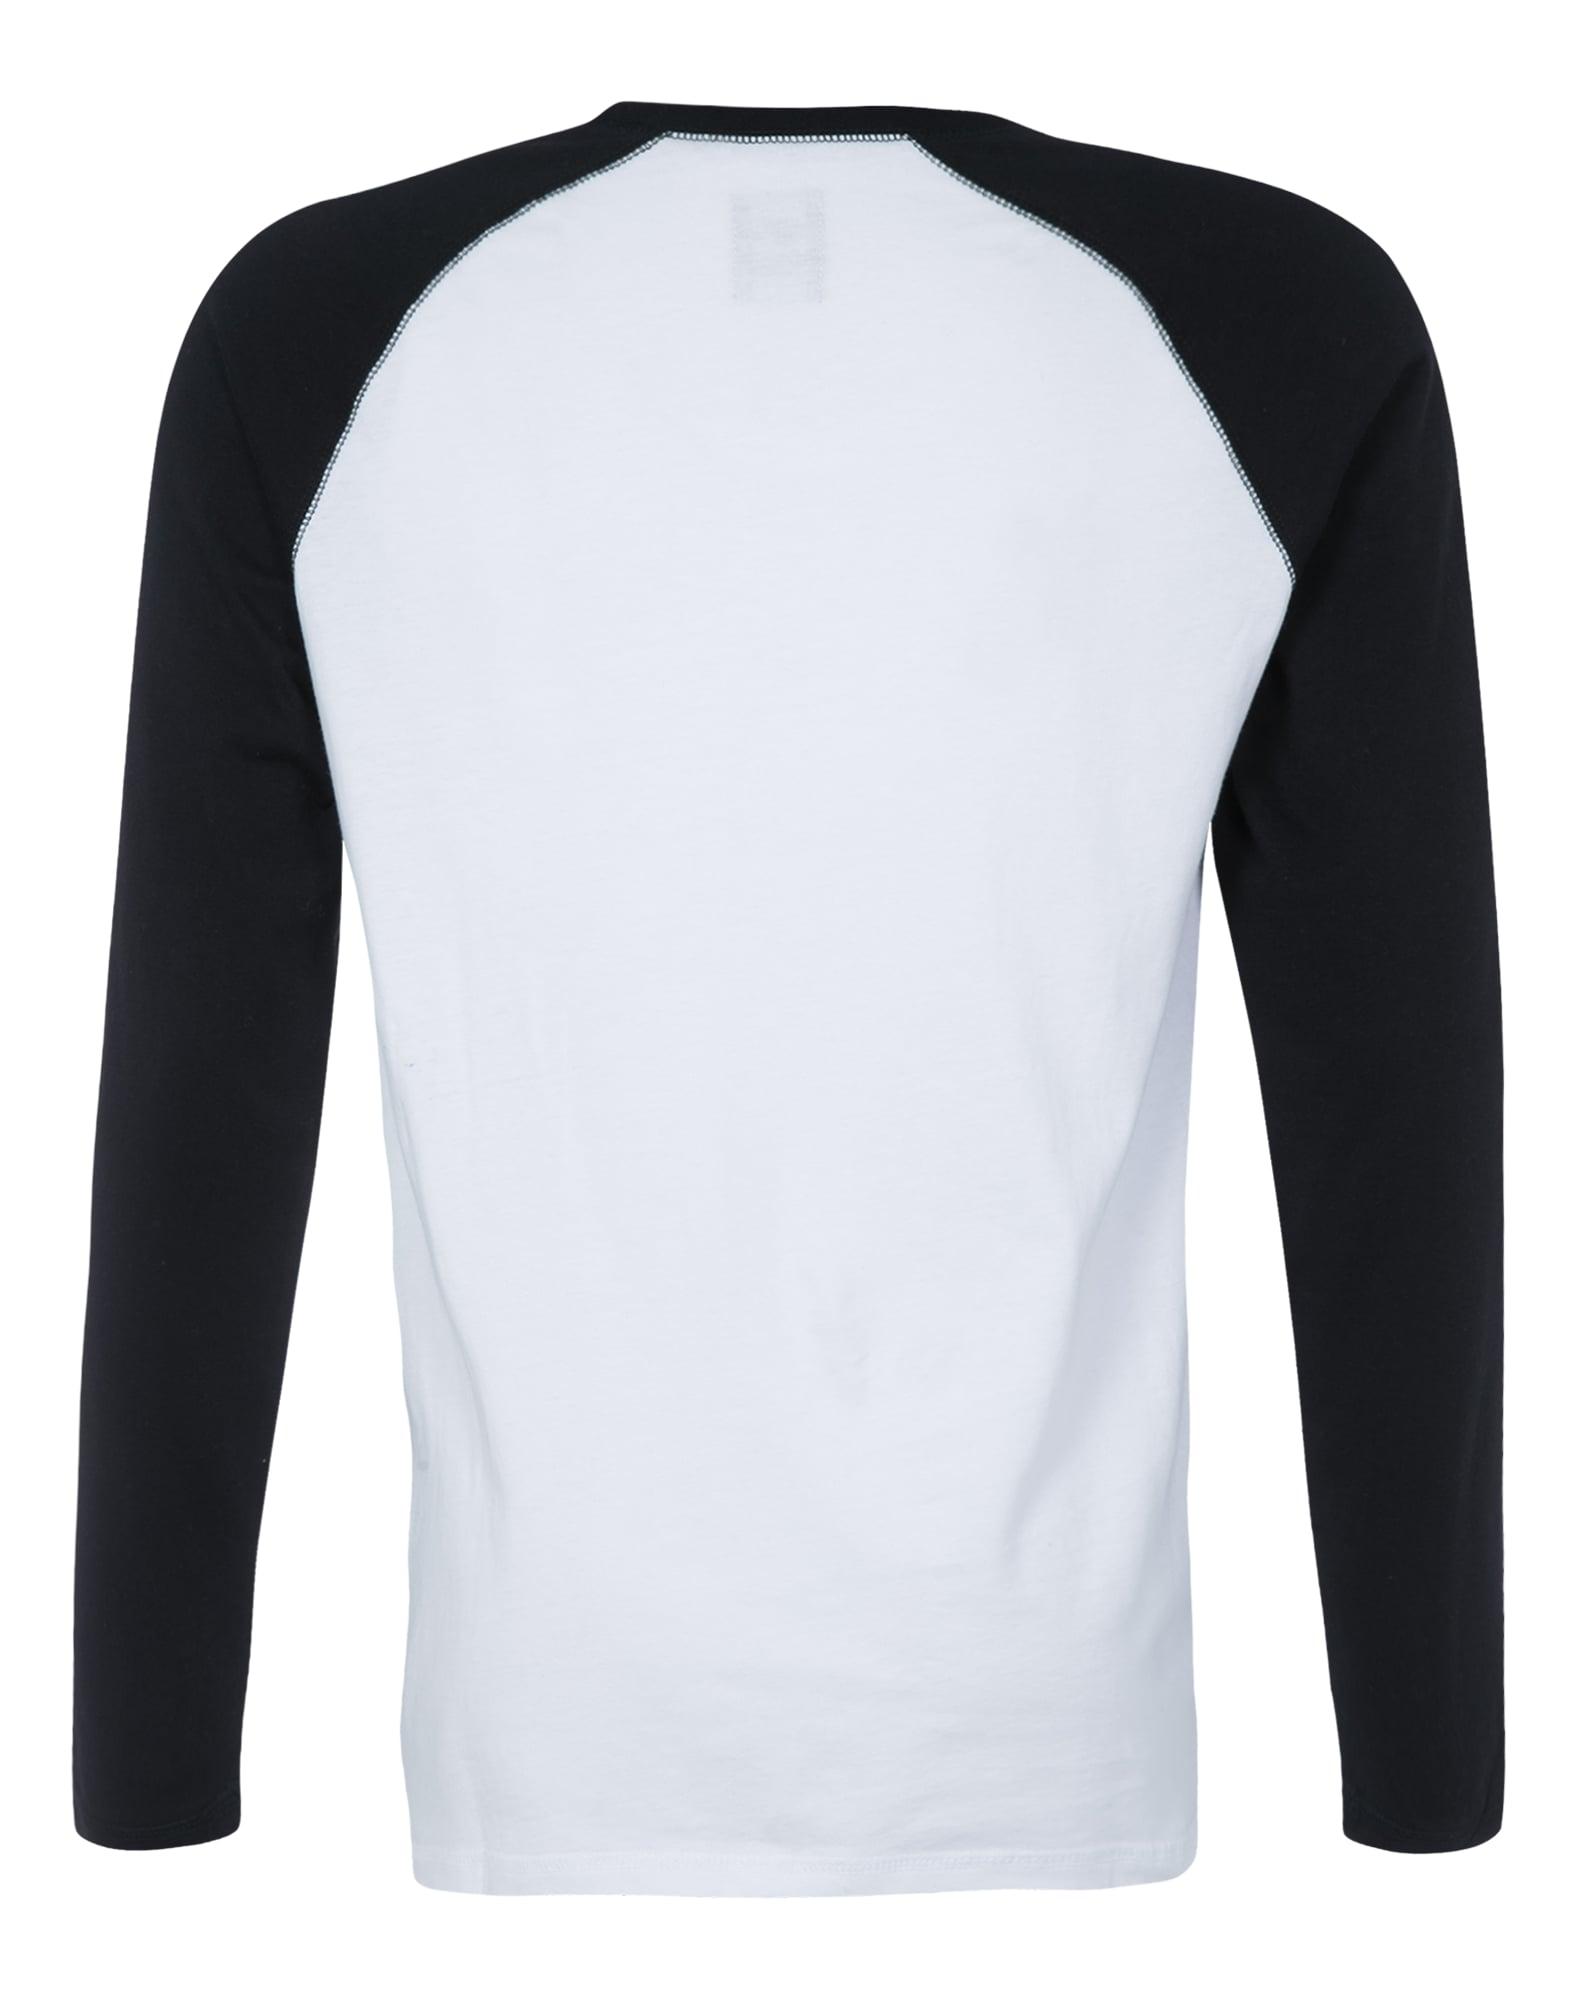 DICKIES, Heren Shirt 'Baseball', zwart - wit